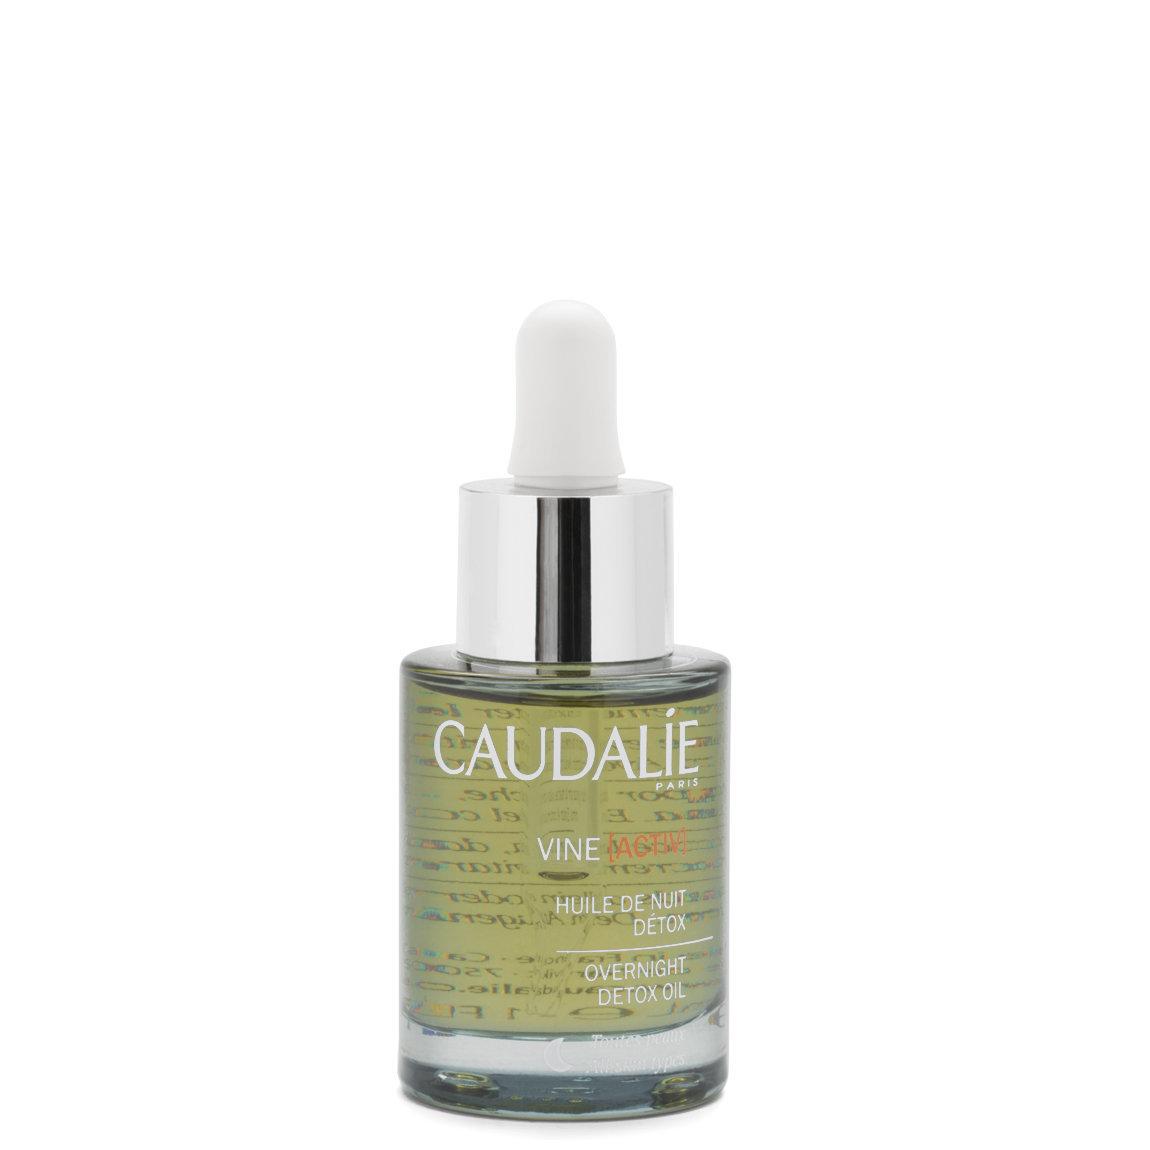 Caudalie Vine[activ] Overnight Detox Oil product swatch.